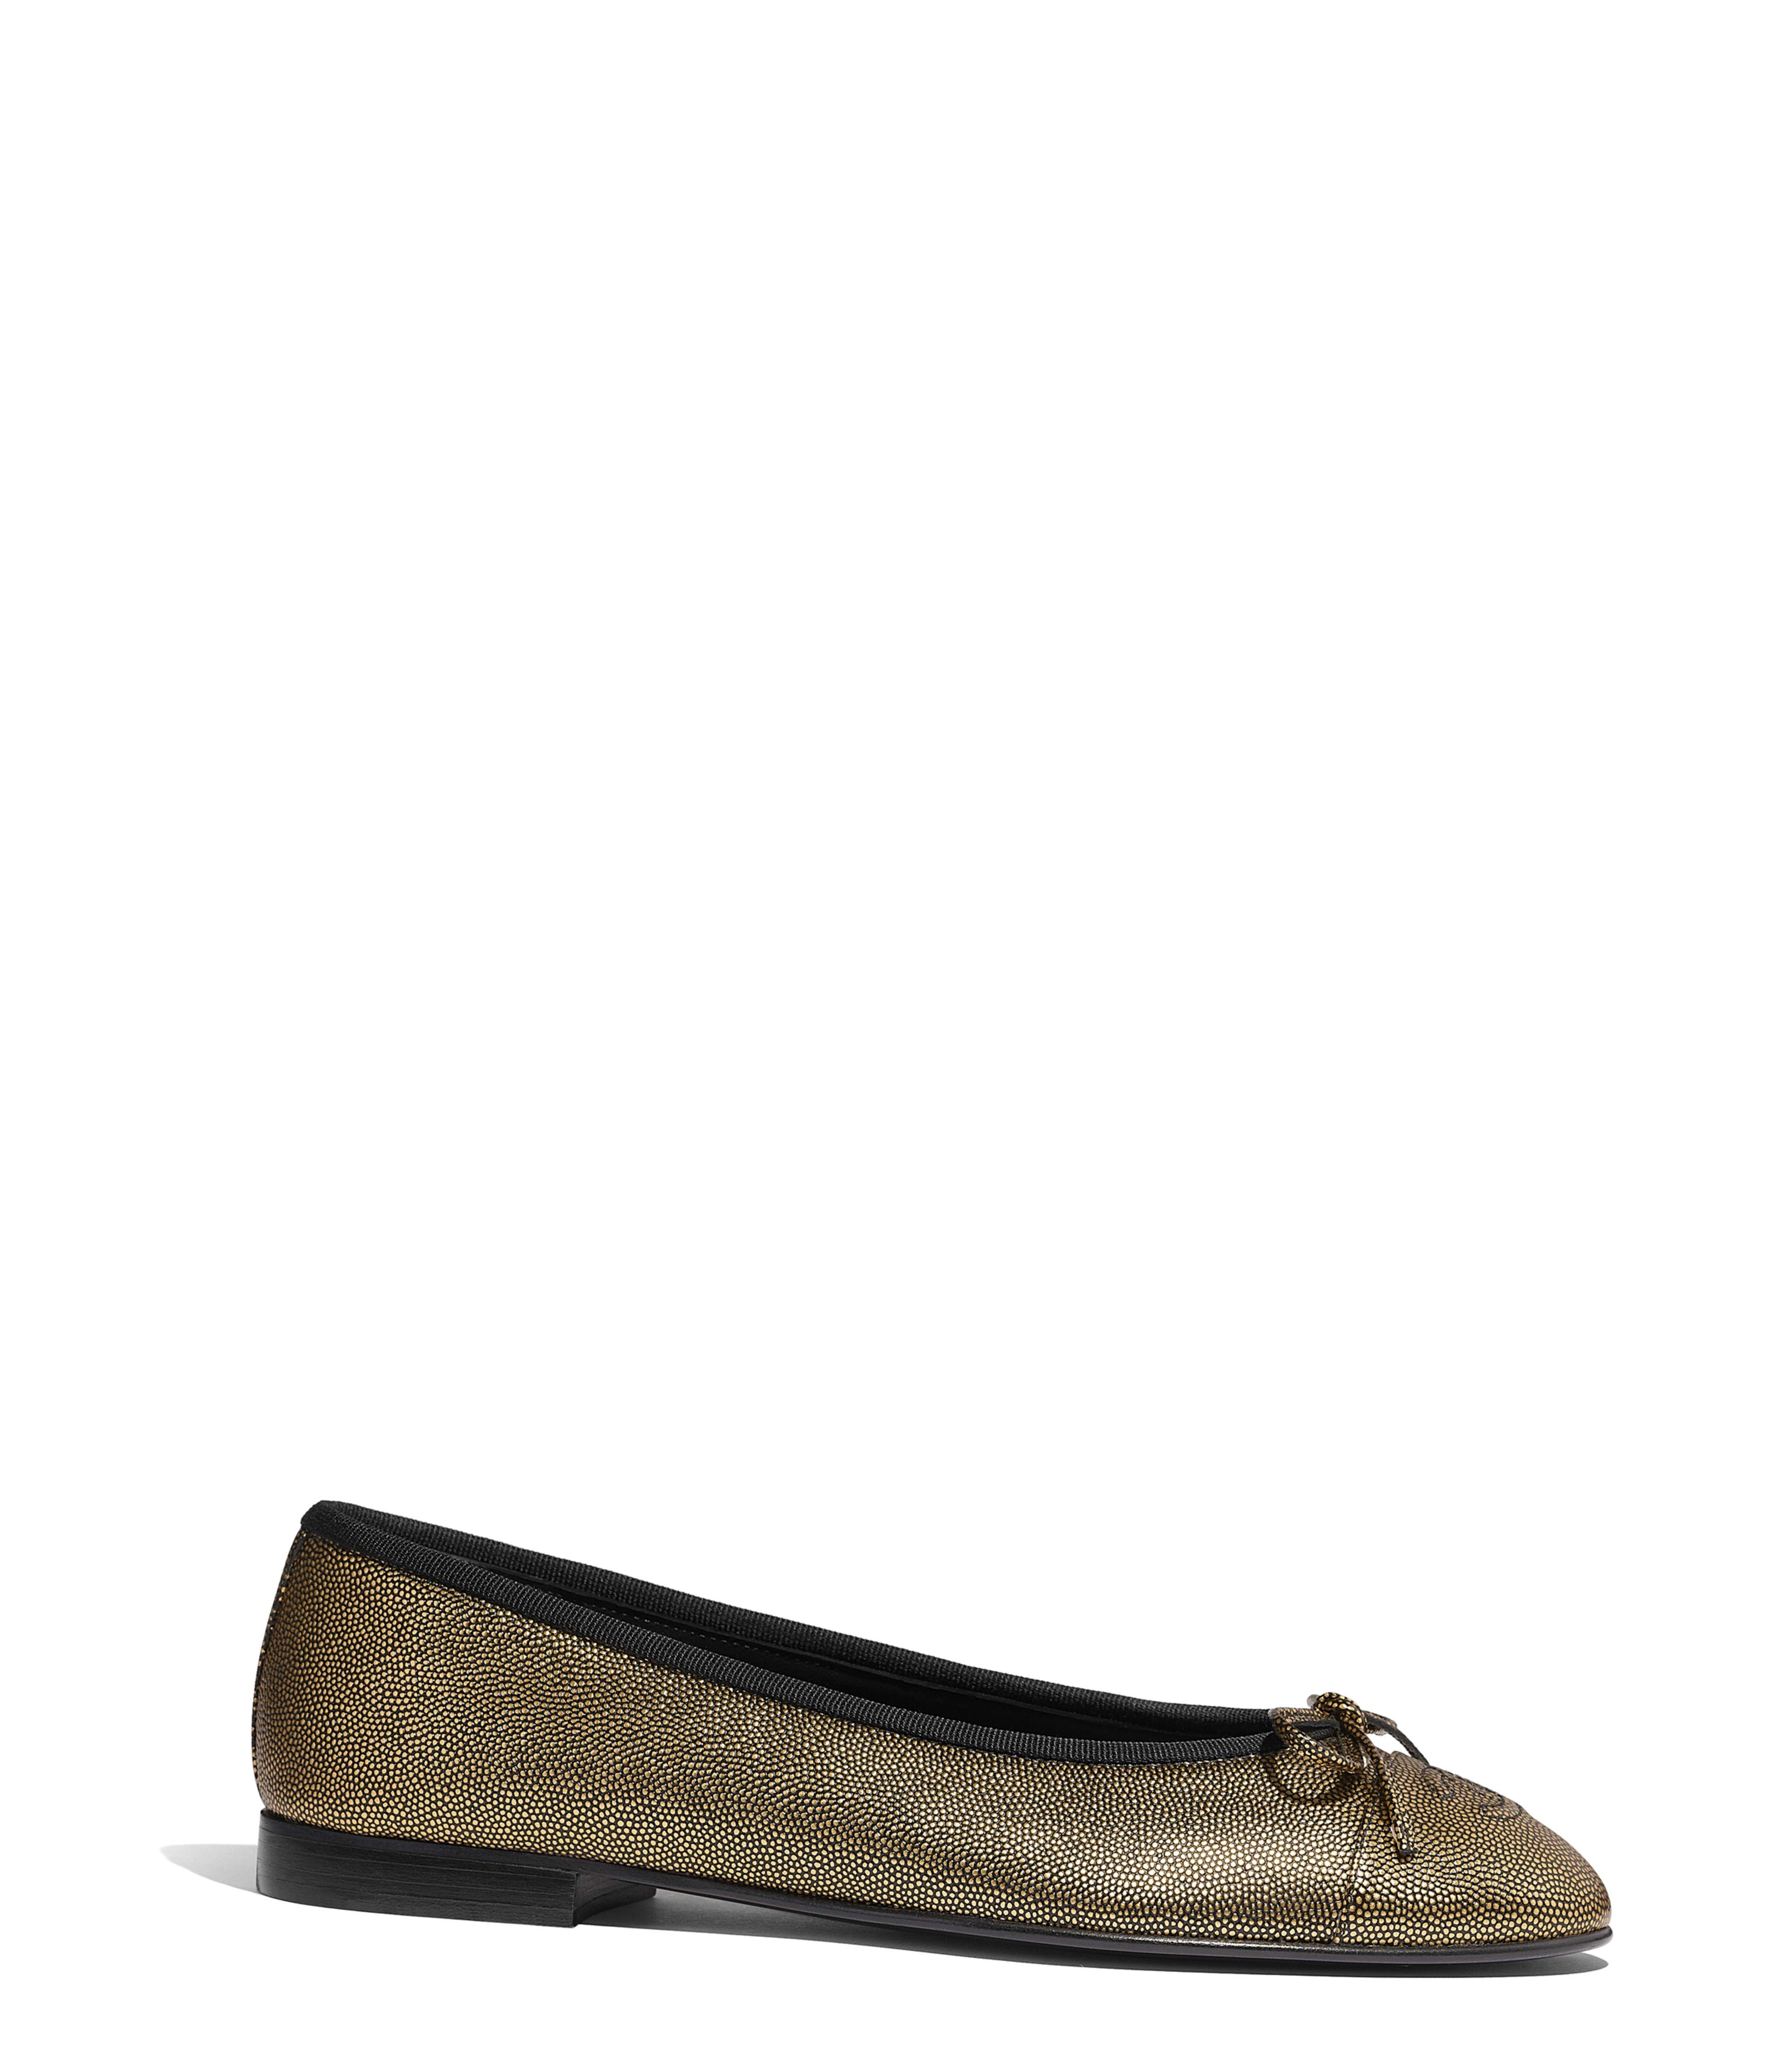 0b264d23647 Shoes - Fashion   CHANEL